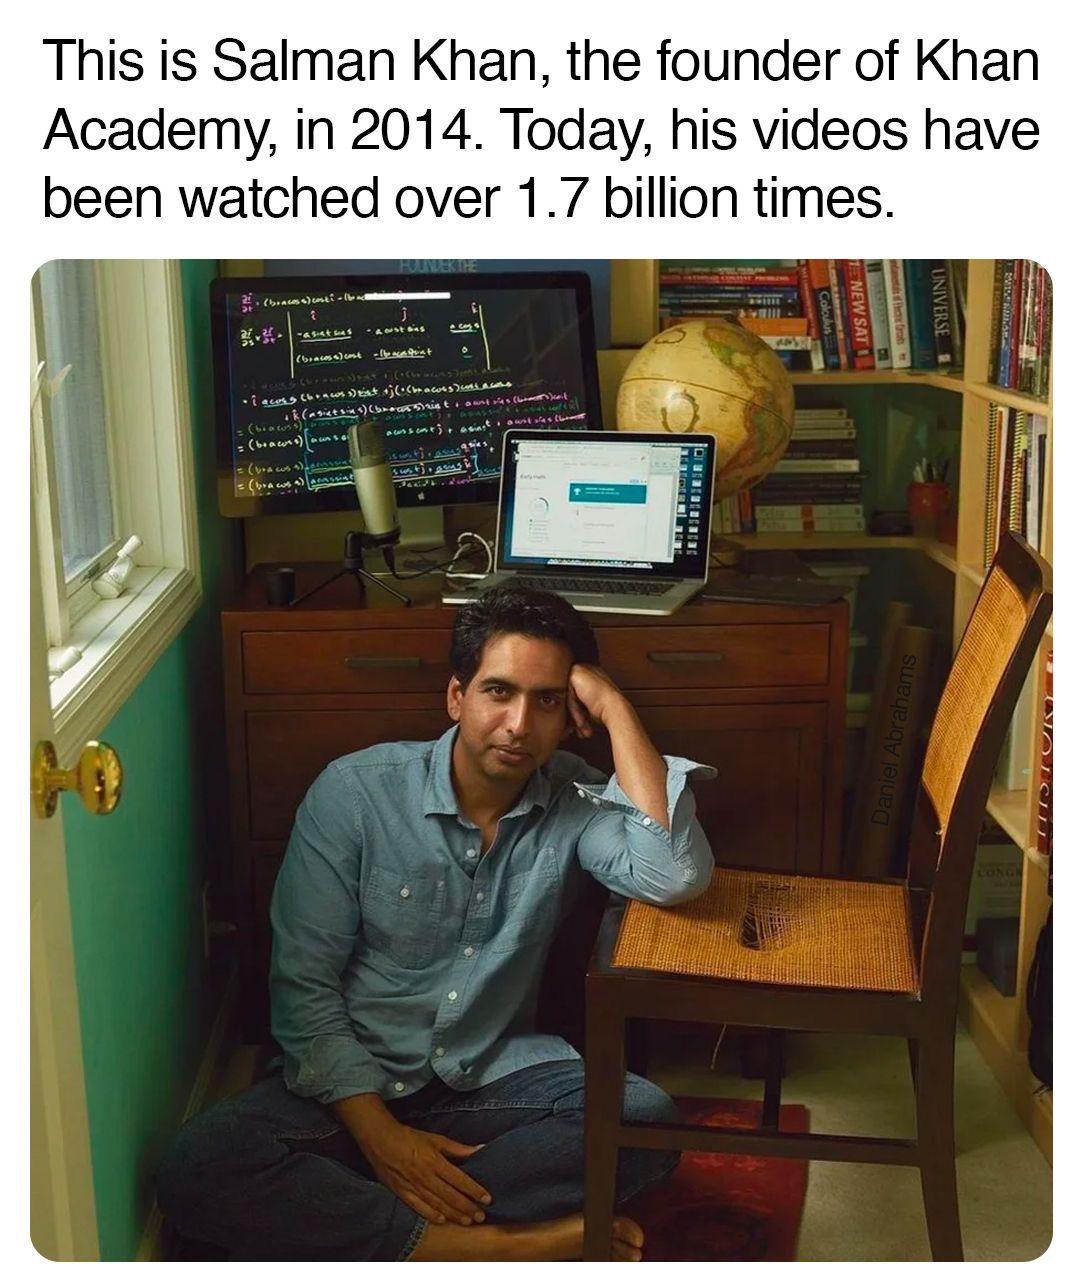 Dr. Kushal Sanghvi on LinkedIn: #venturecapital #edtech #media | 29 comments